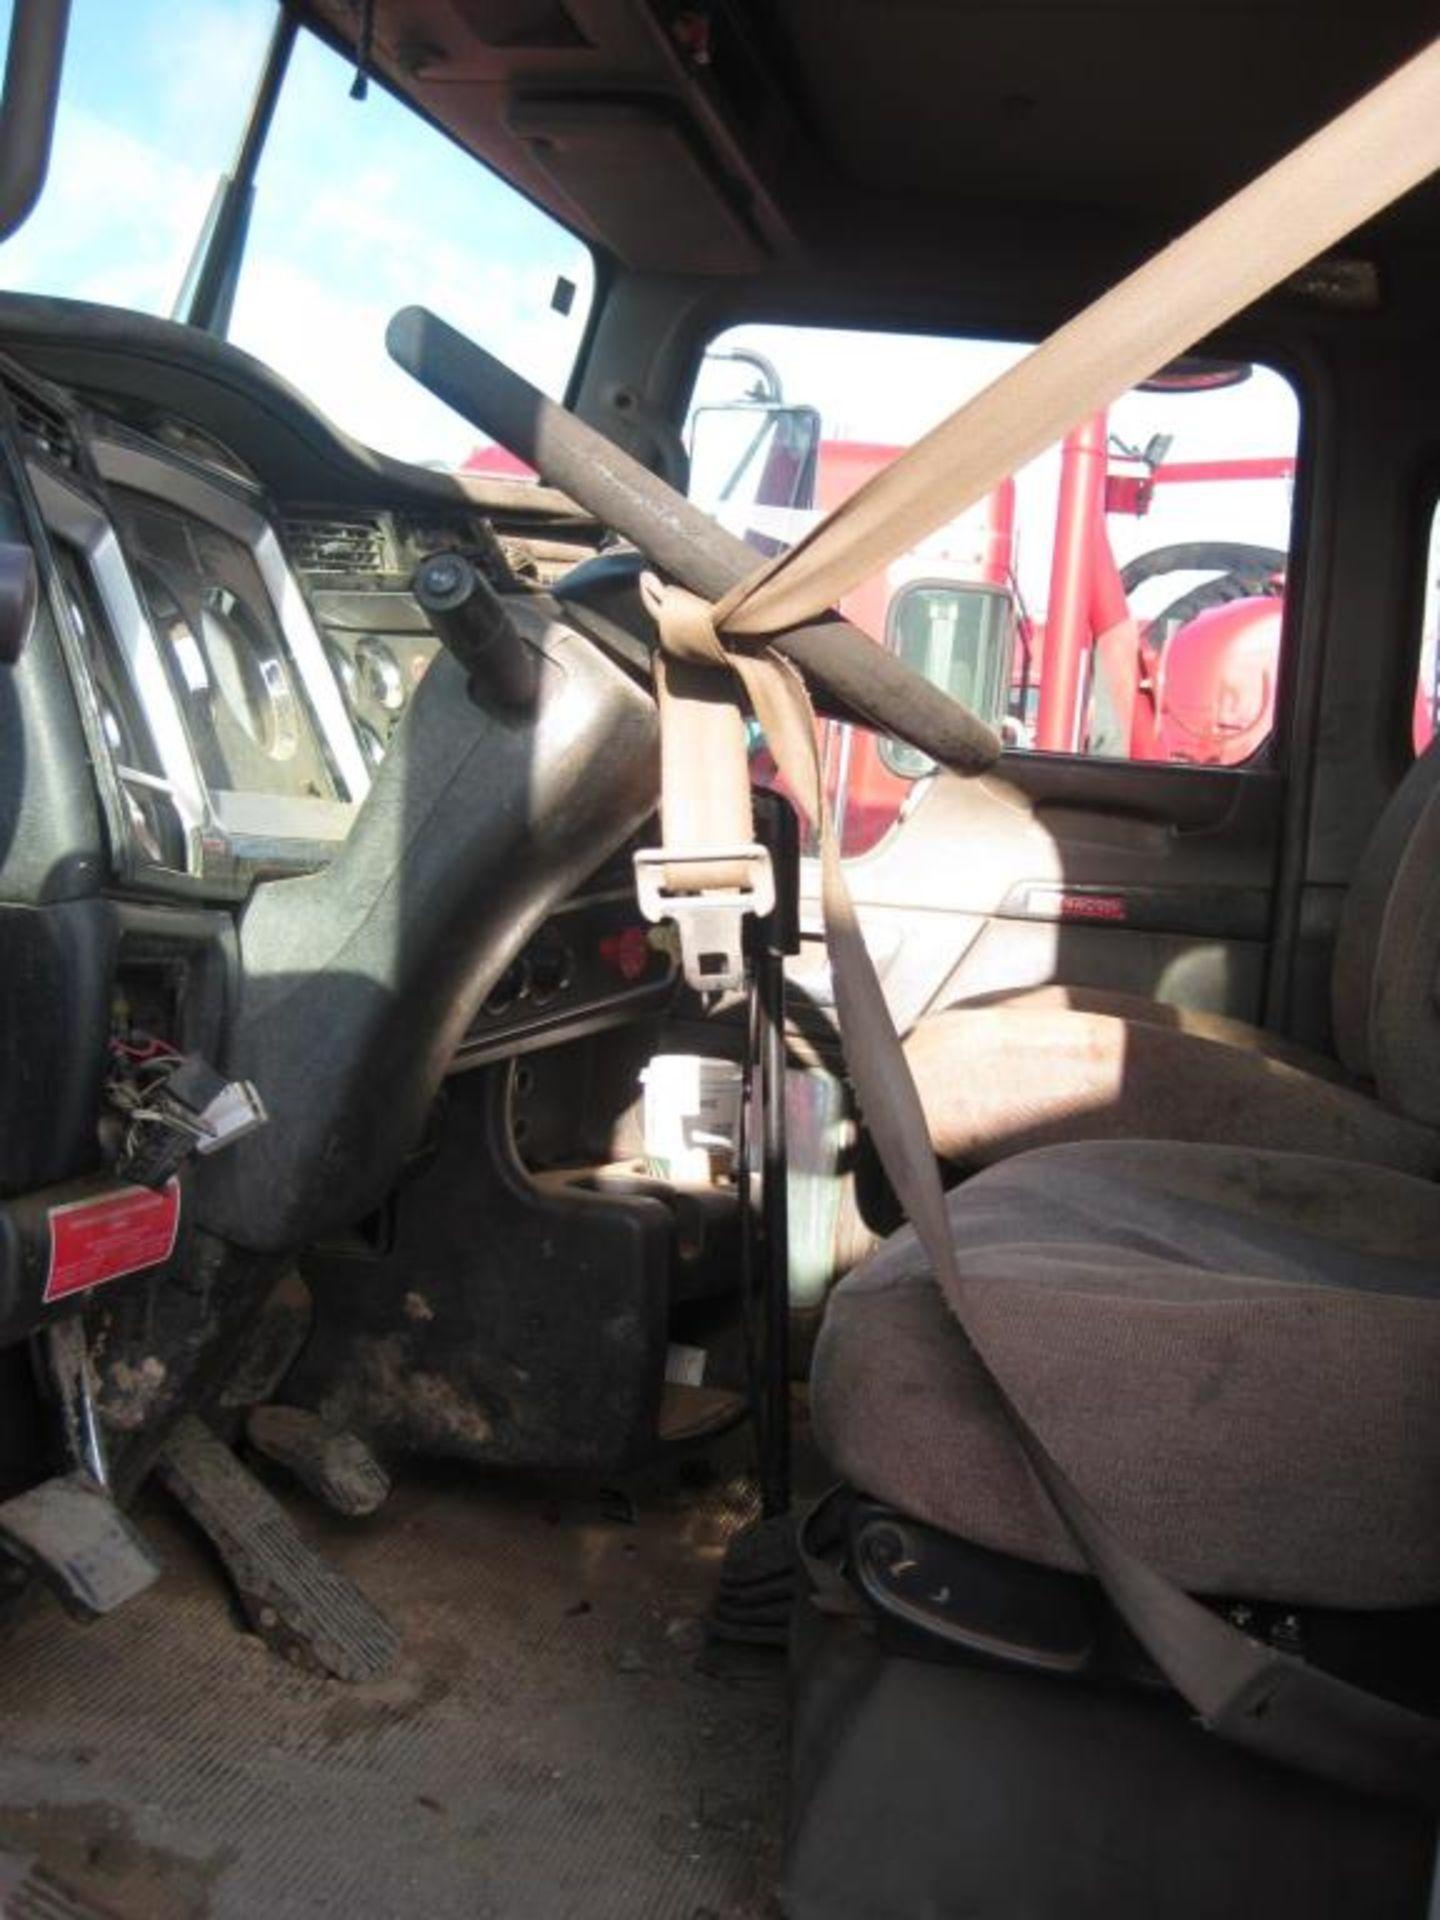 Kenworth Winch Truck - Image 13 of 22